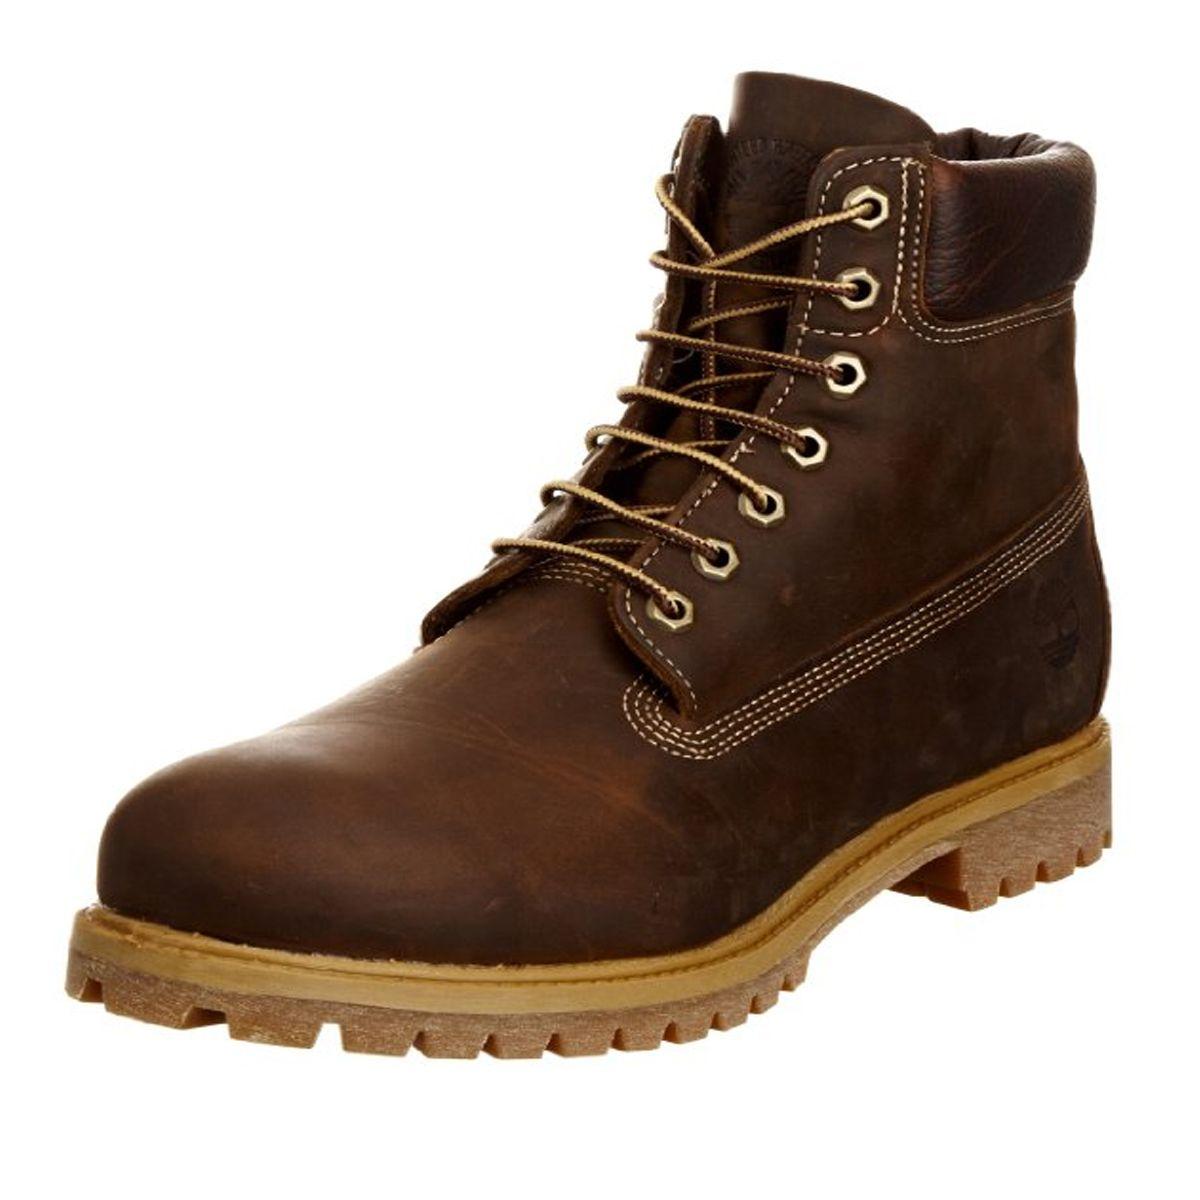 boots grande taille du 47 5 au 50 size factory timberland. Black Bedroom Furniture Sets. Home Design Ideas